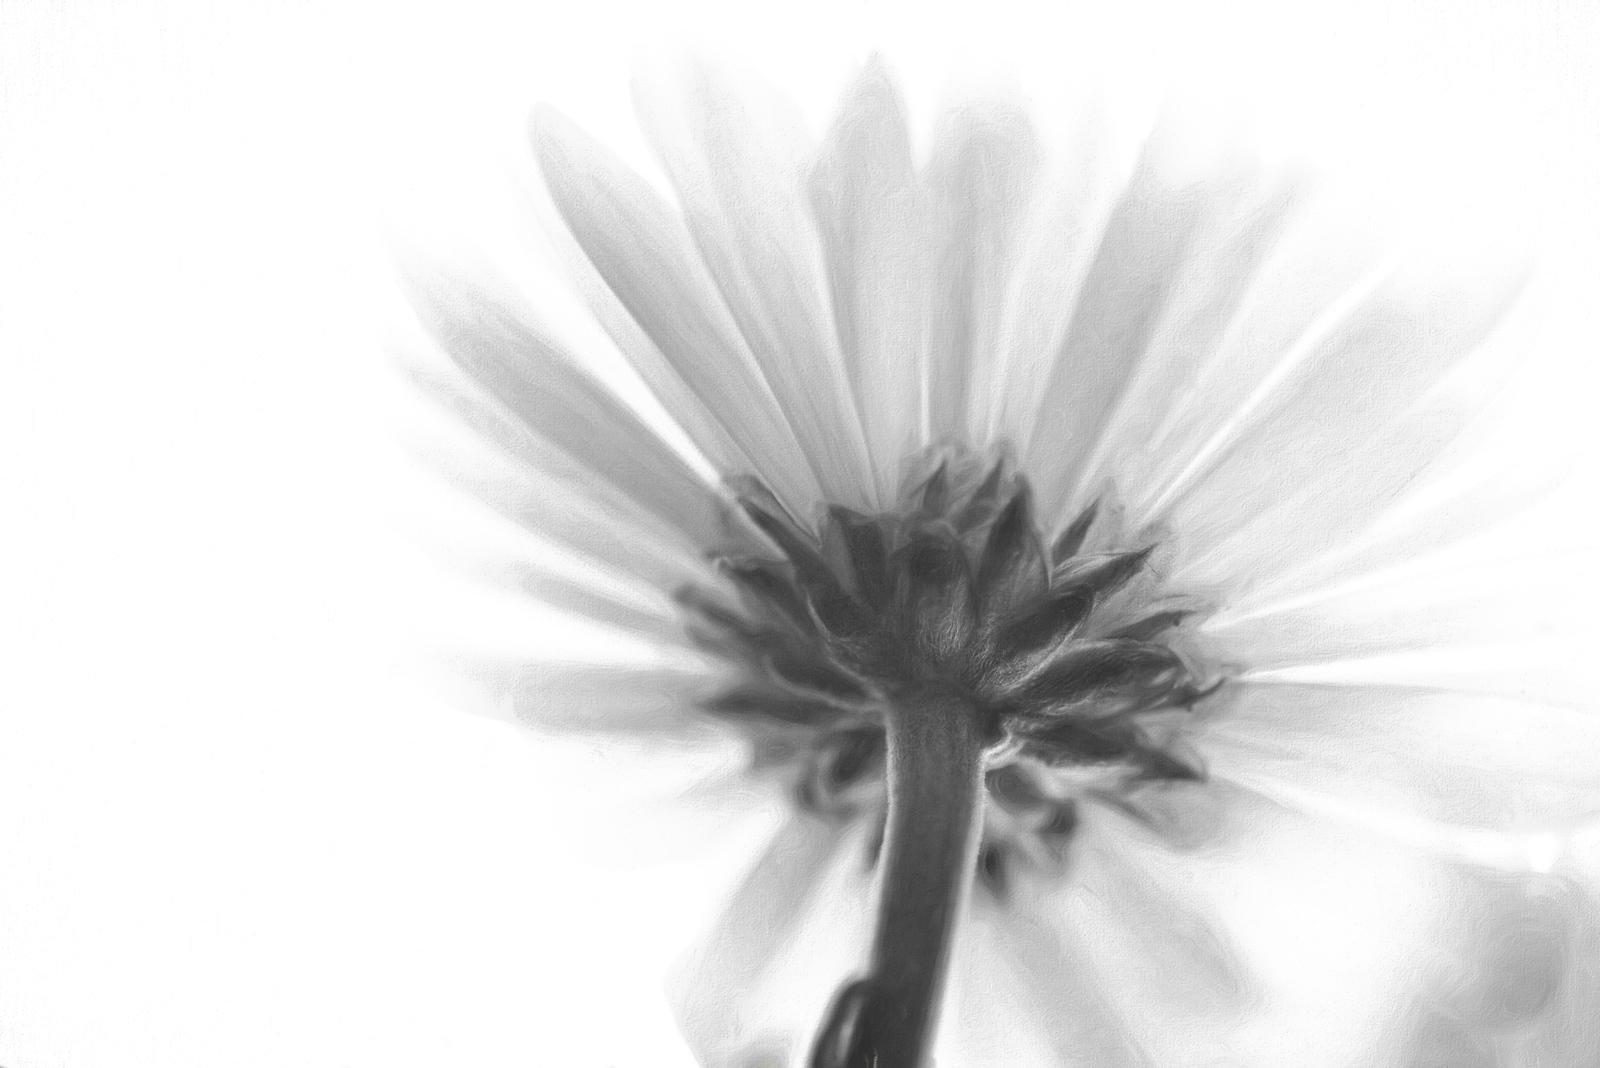 Black and White Daisy